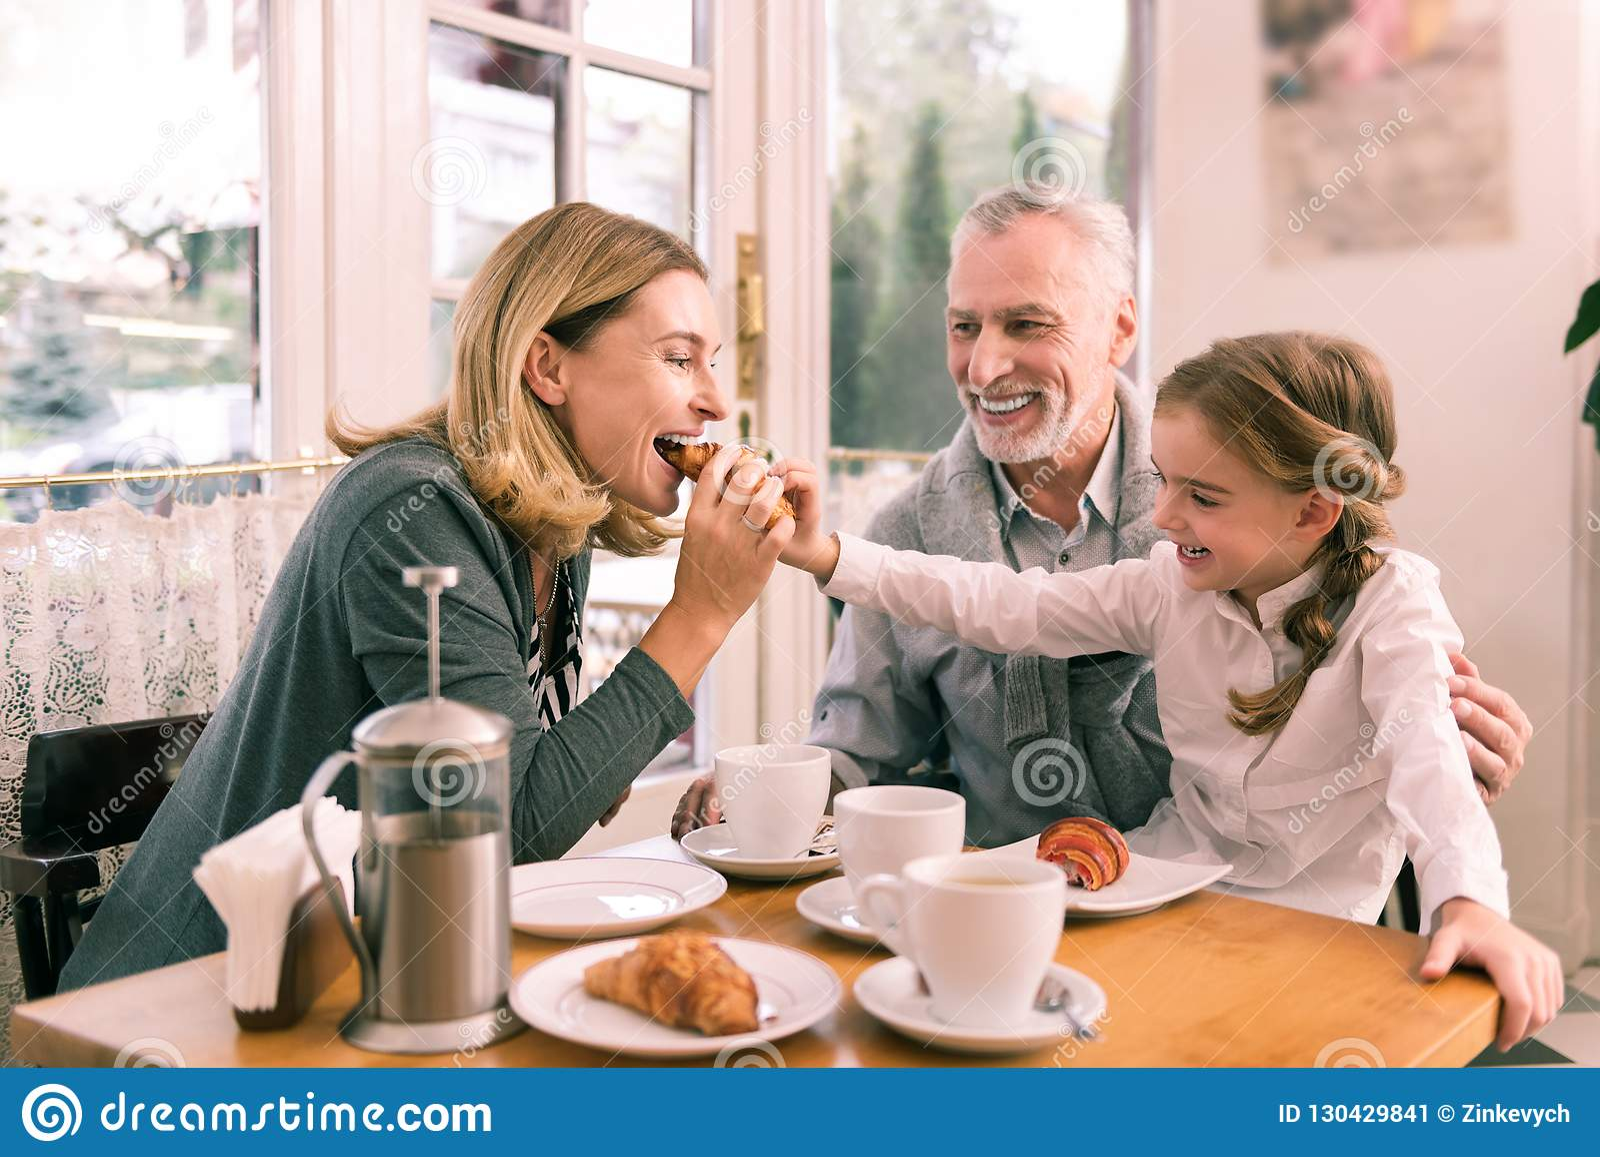 Leuke kind-hearted kleindochter die haar croissant met grootmoeder delen